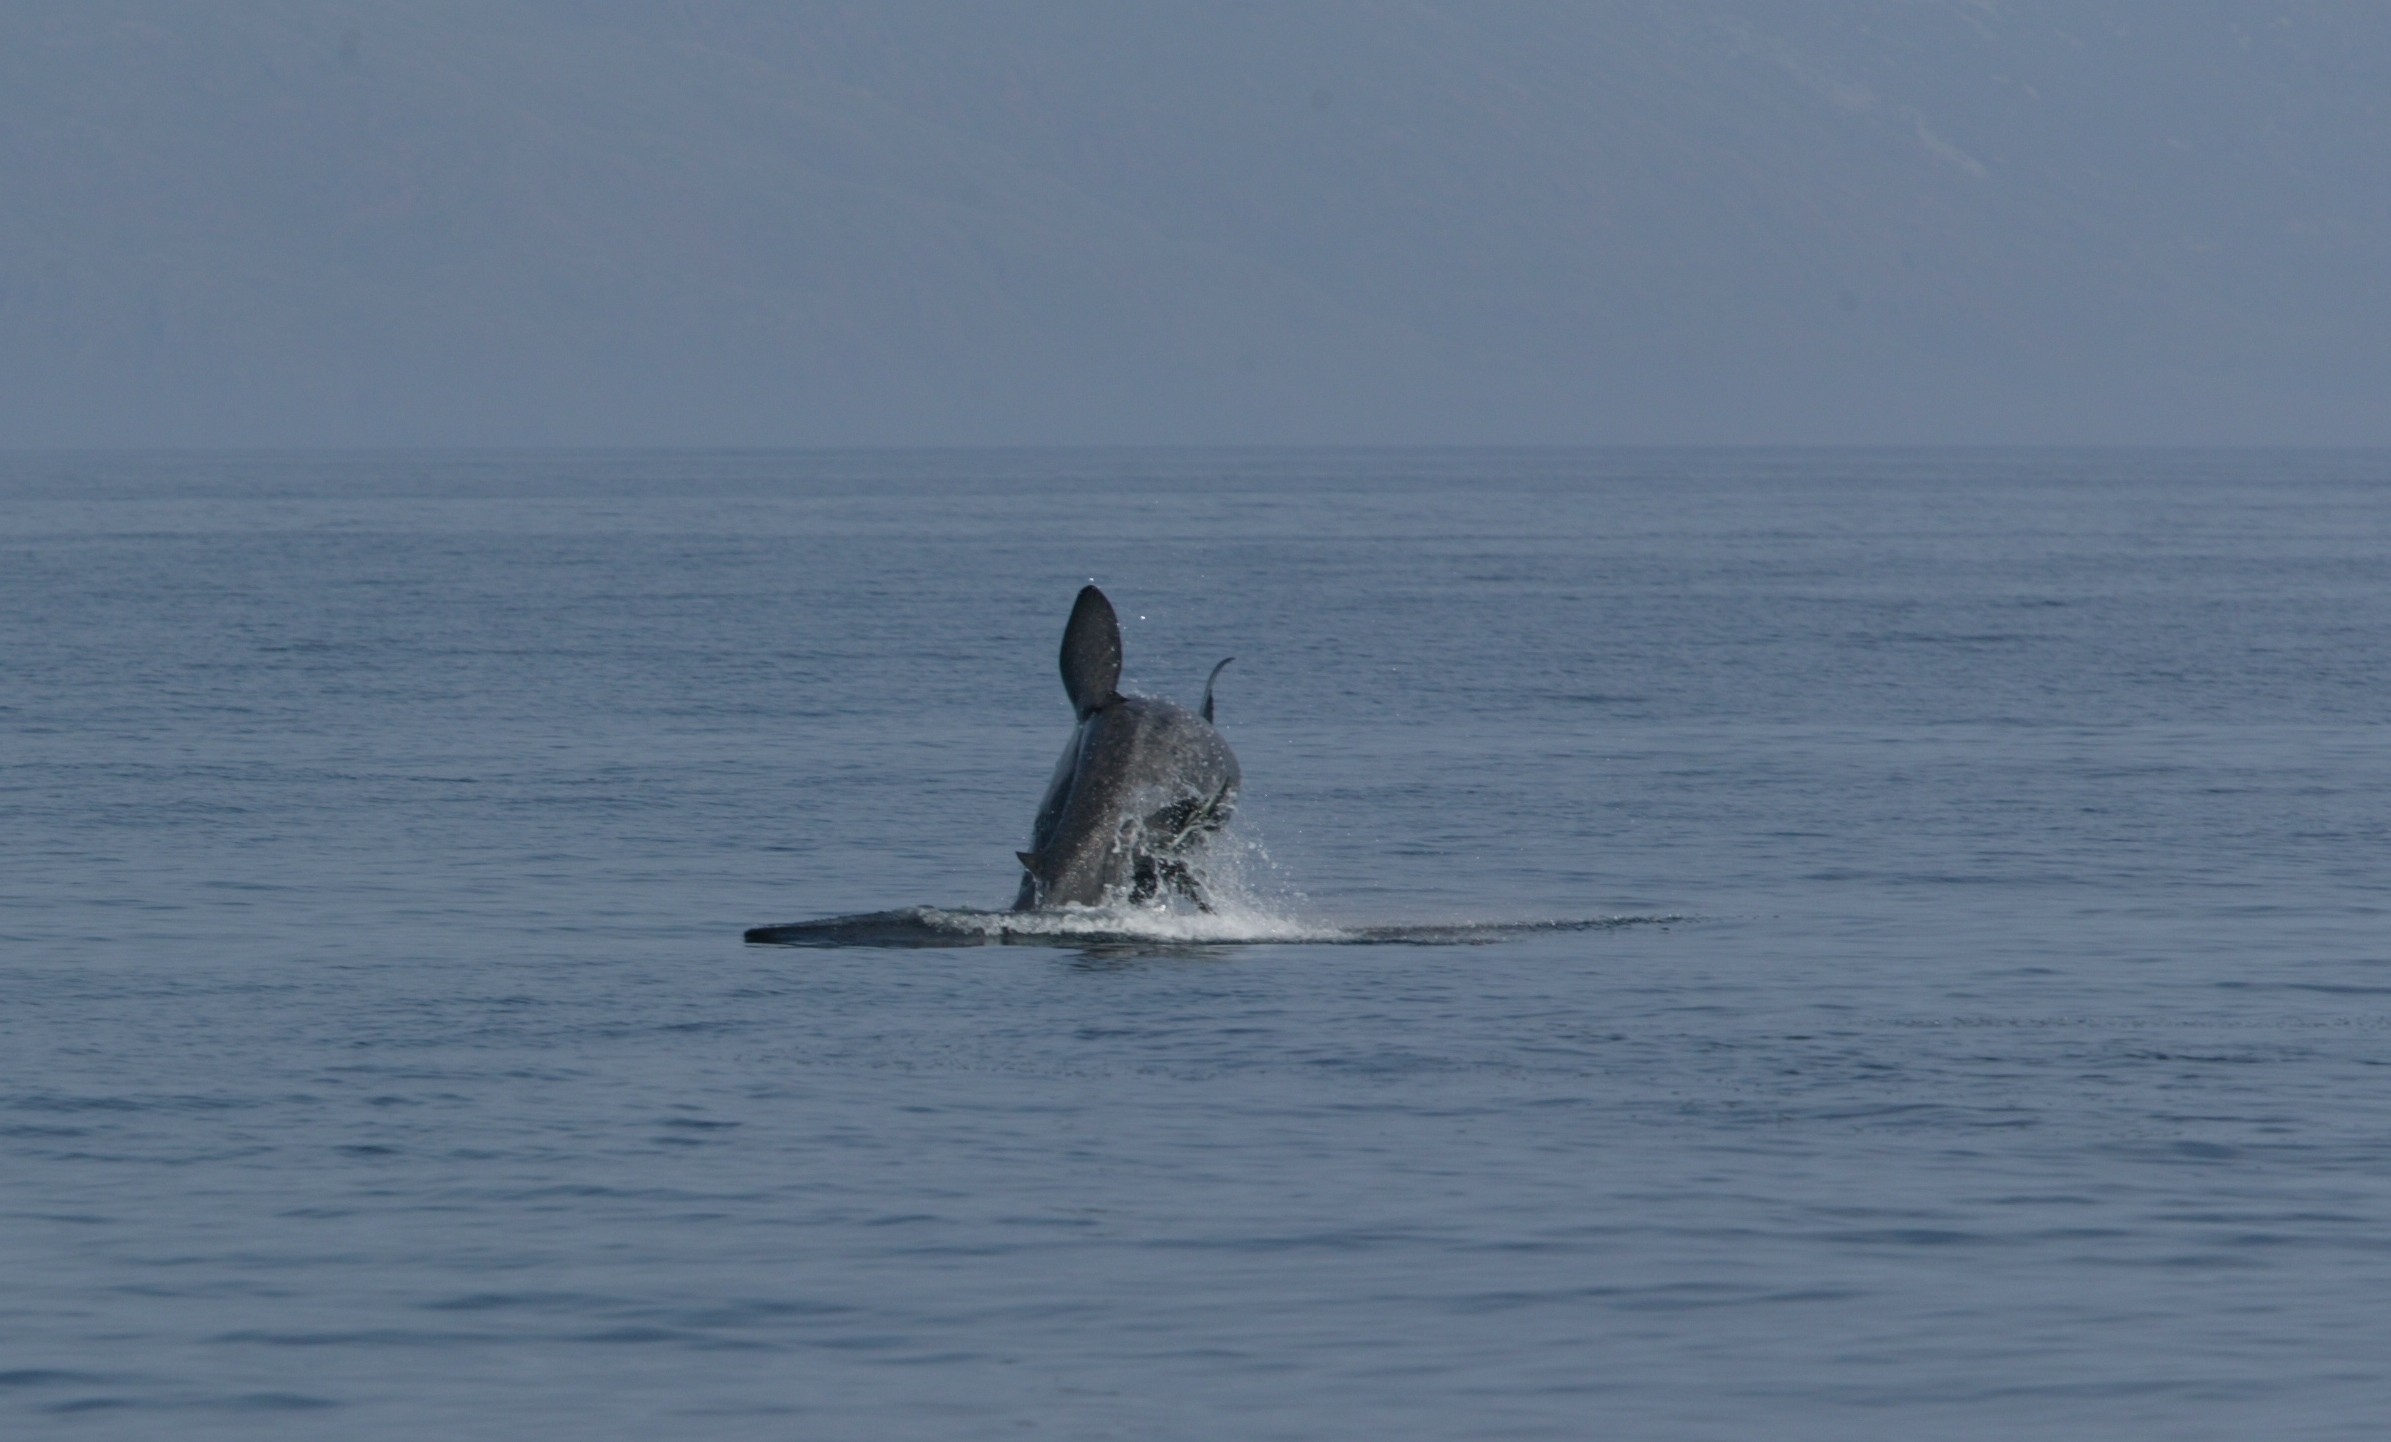 Figure 8: Breaching basking shark. Copyright © Colin Speedie.